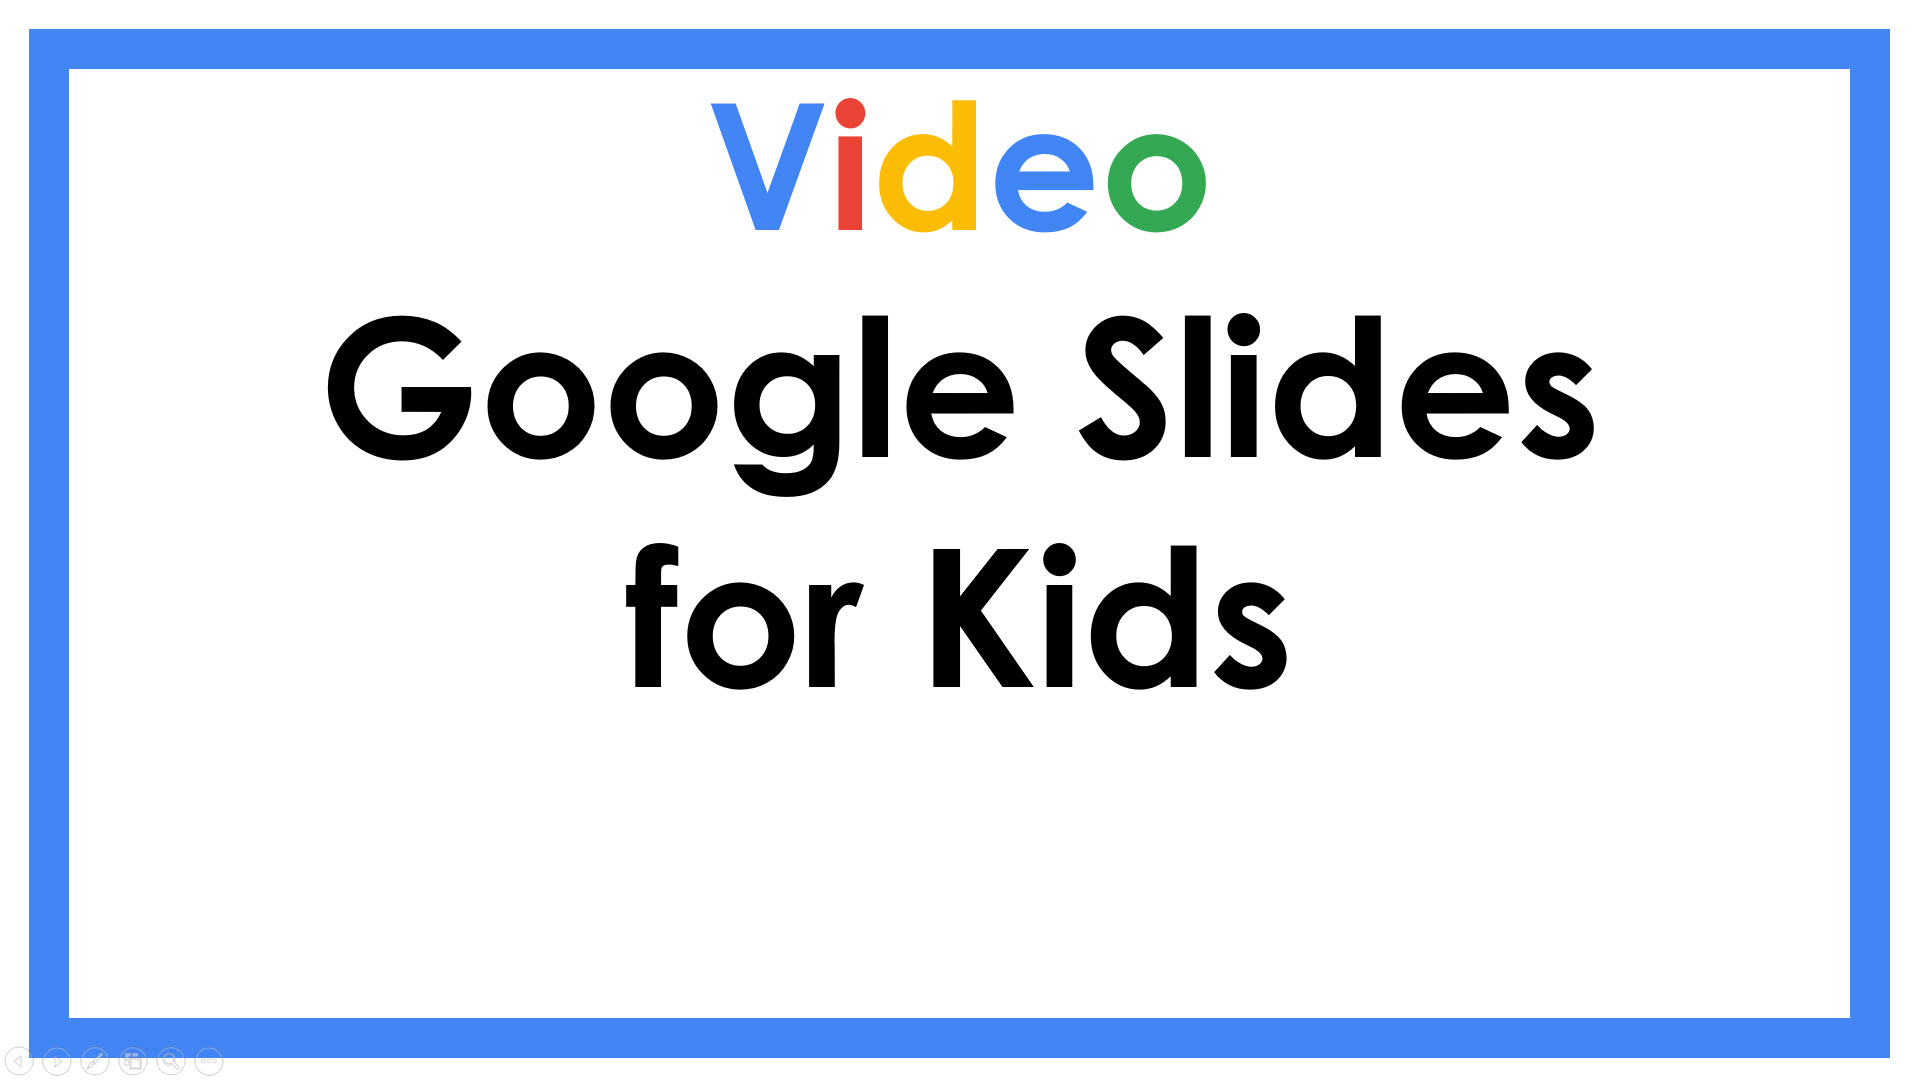 Google Slides for Kids